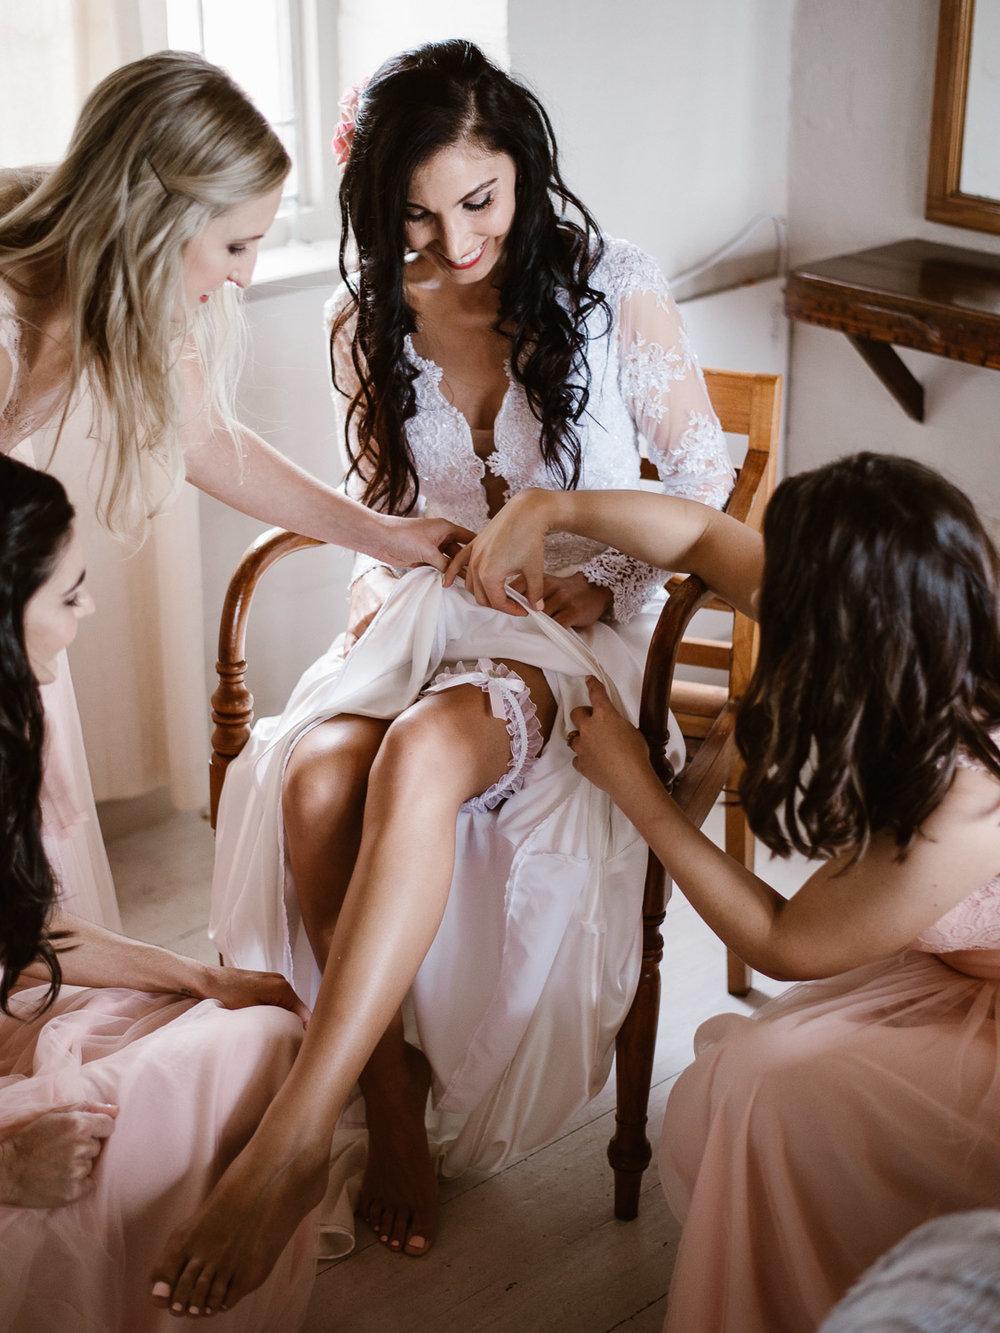 cape-town-wedding-photographer-sean-shannon-photography-29.jpg